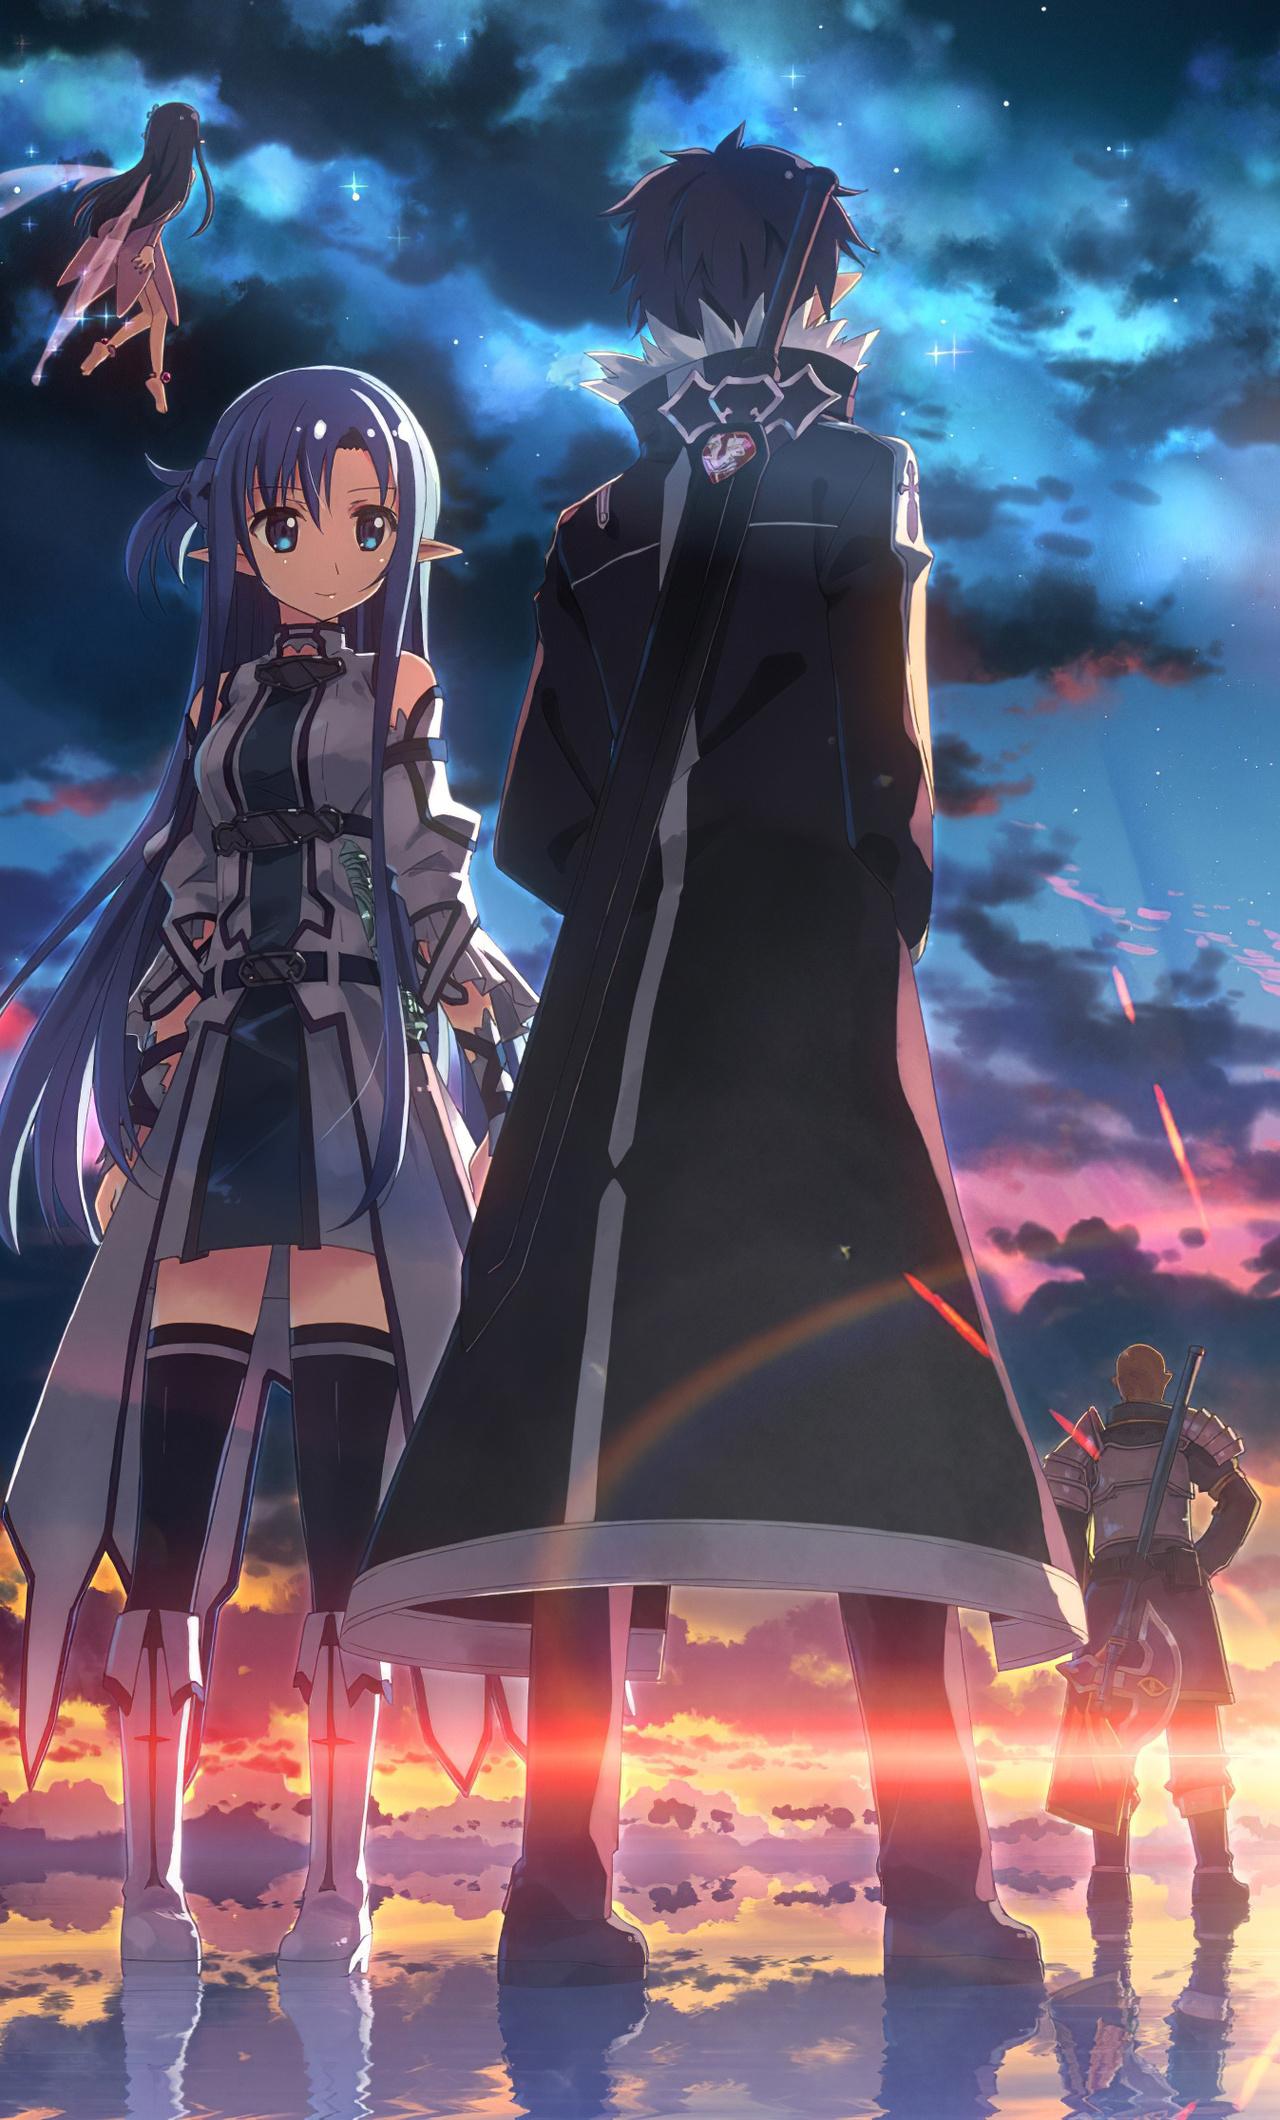 1280x2120 Sword Art Online Anime 4k Iphone 6 Hd 4k